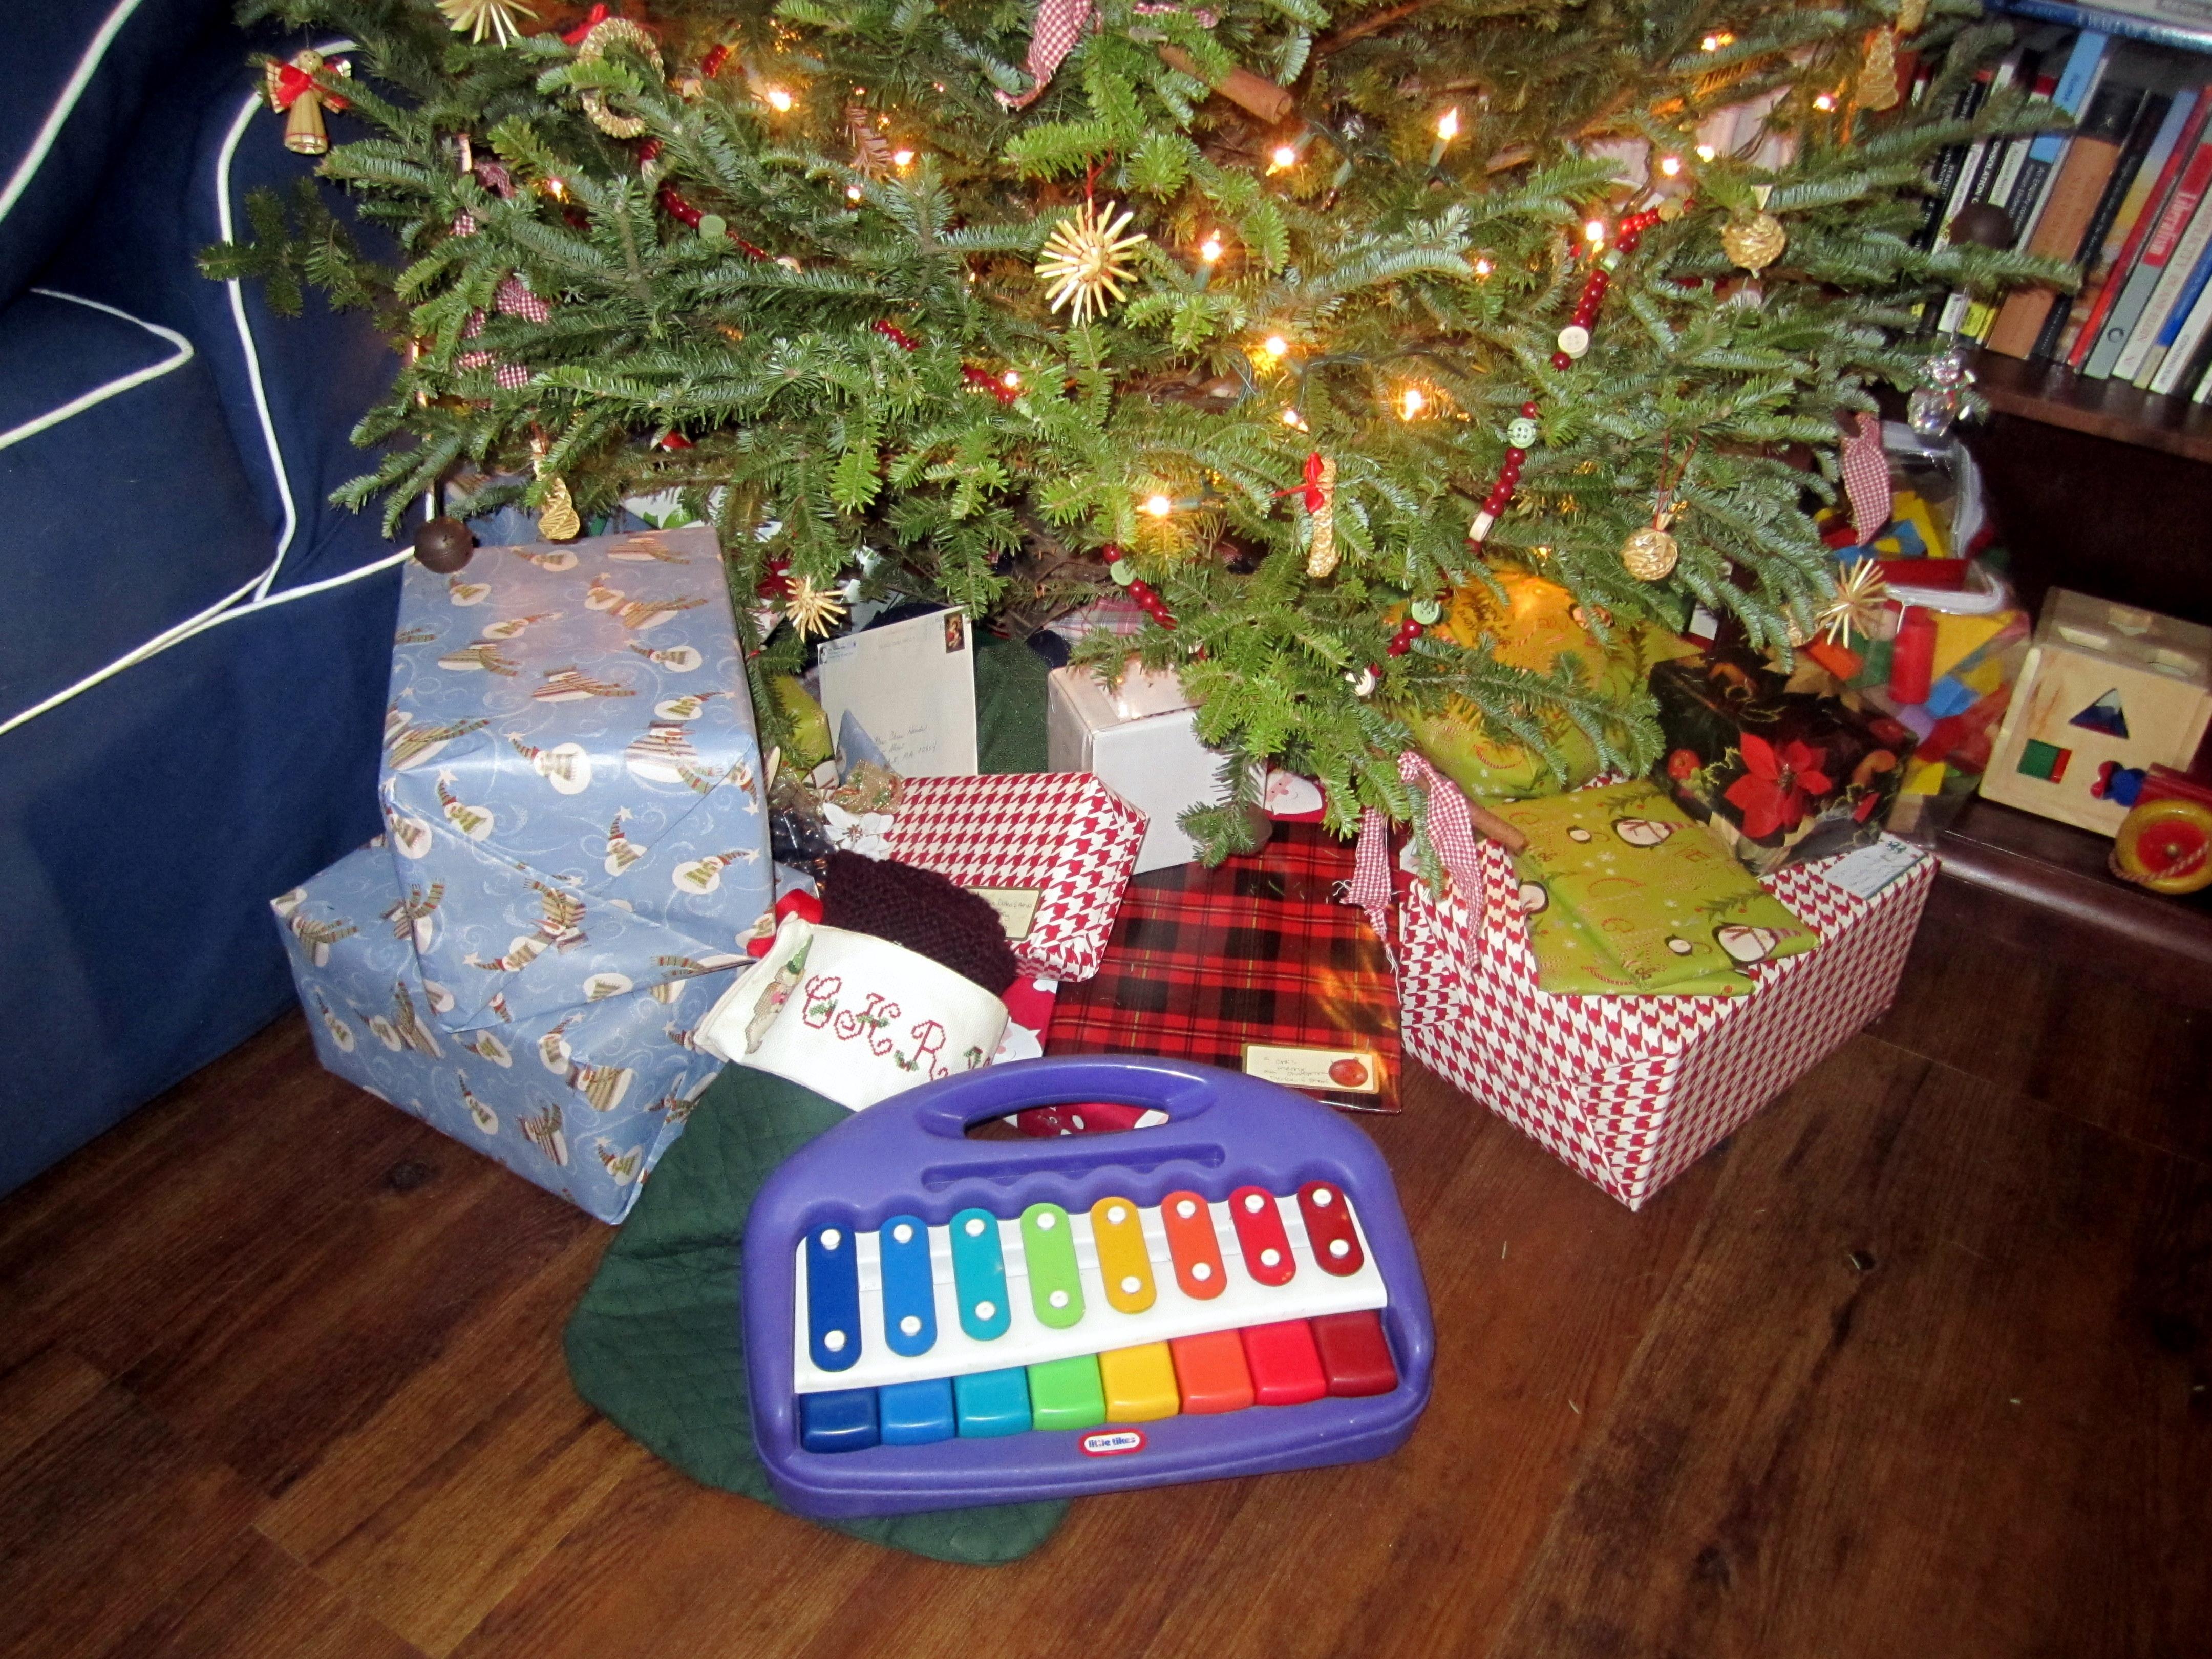 Reflections on Christmas - Au Coeur